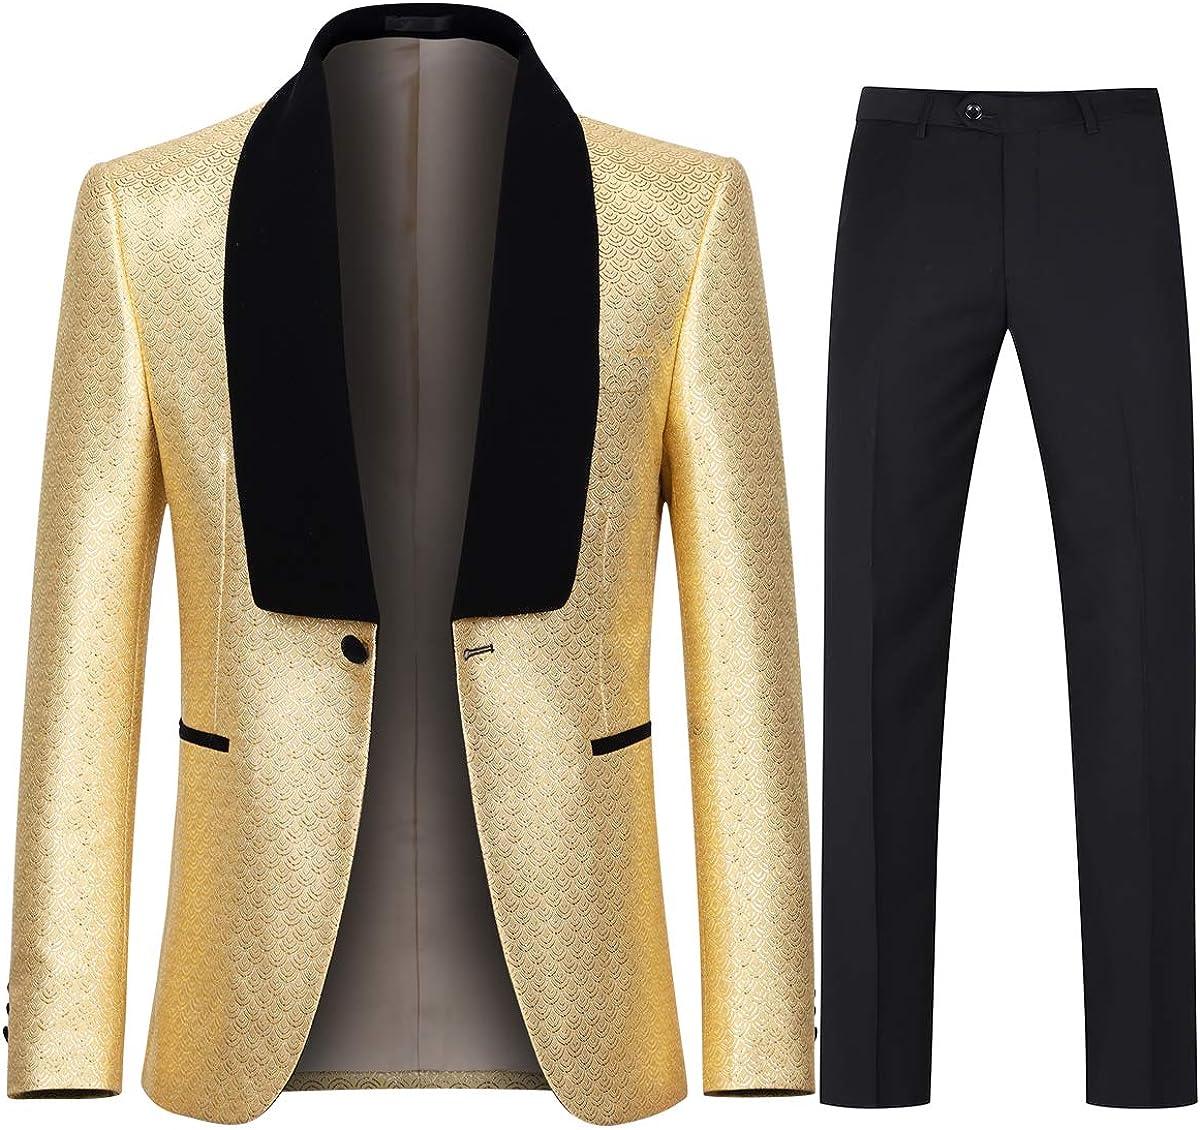 Boyland Men's Tuxedo Suits Slim Fit Luxury 2 Pieces Suit Set Tux Jacket Pants Homecoming Dinner Prom Party Dress